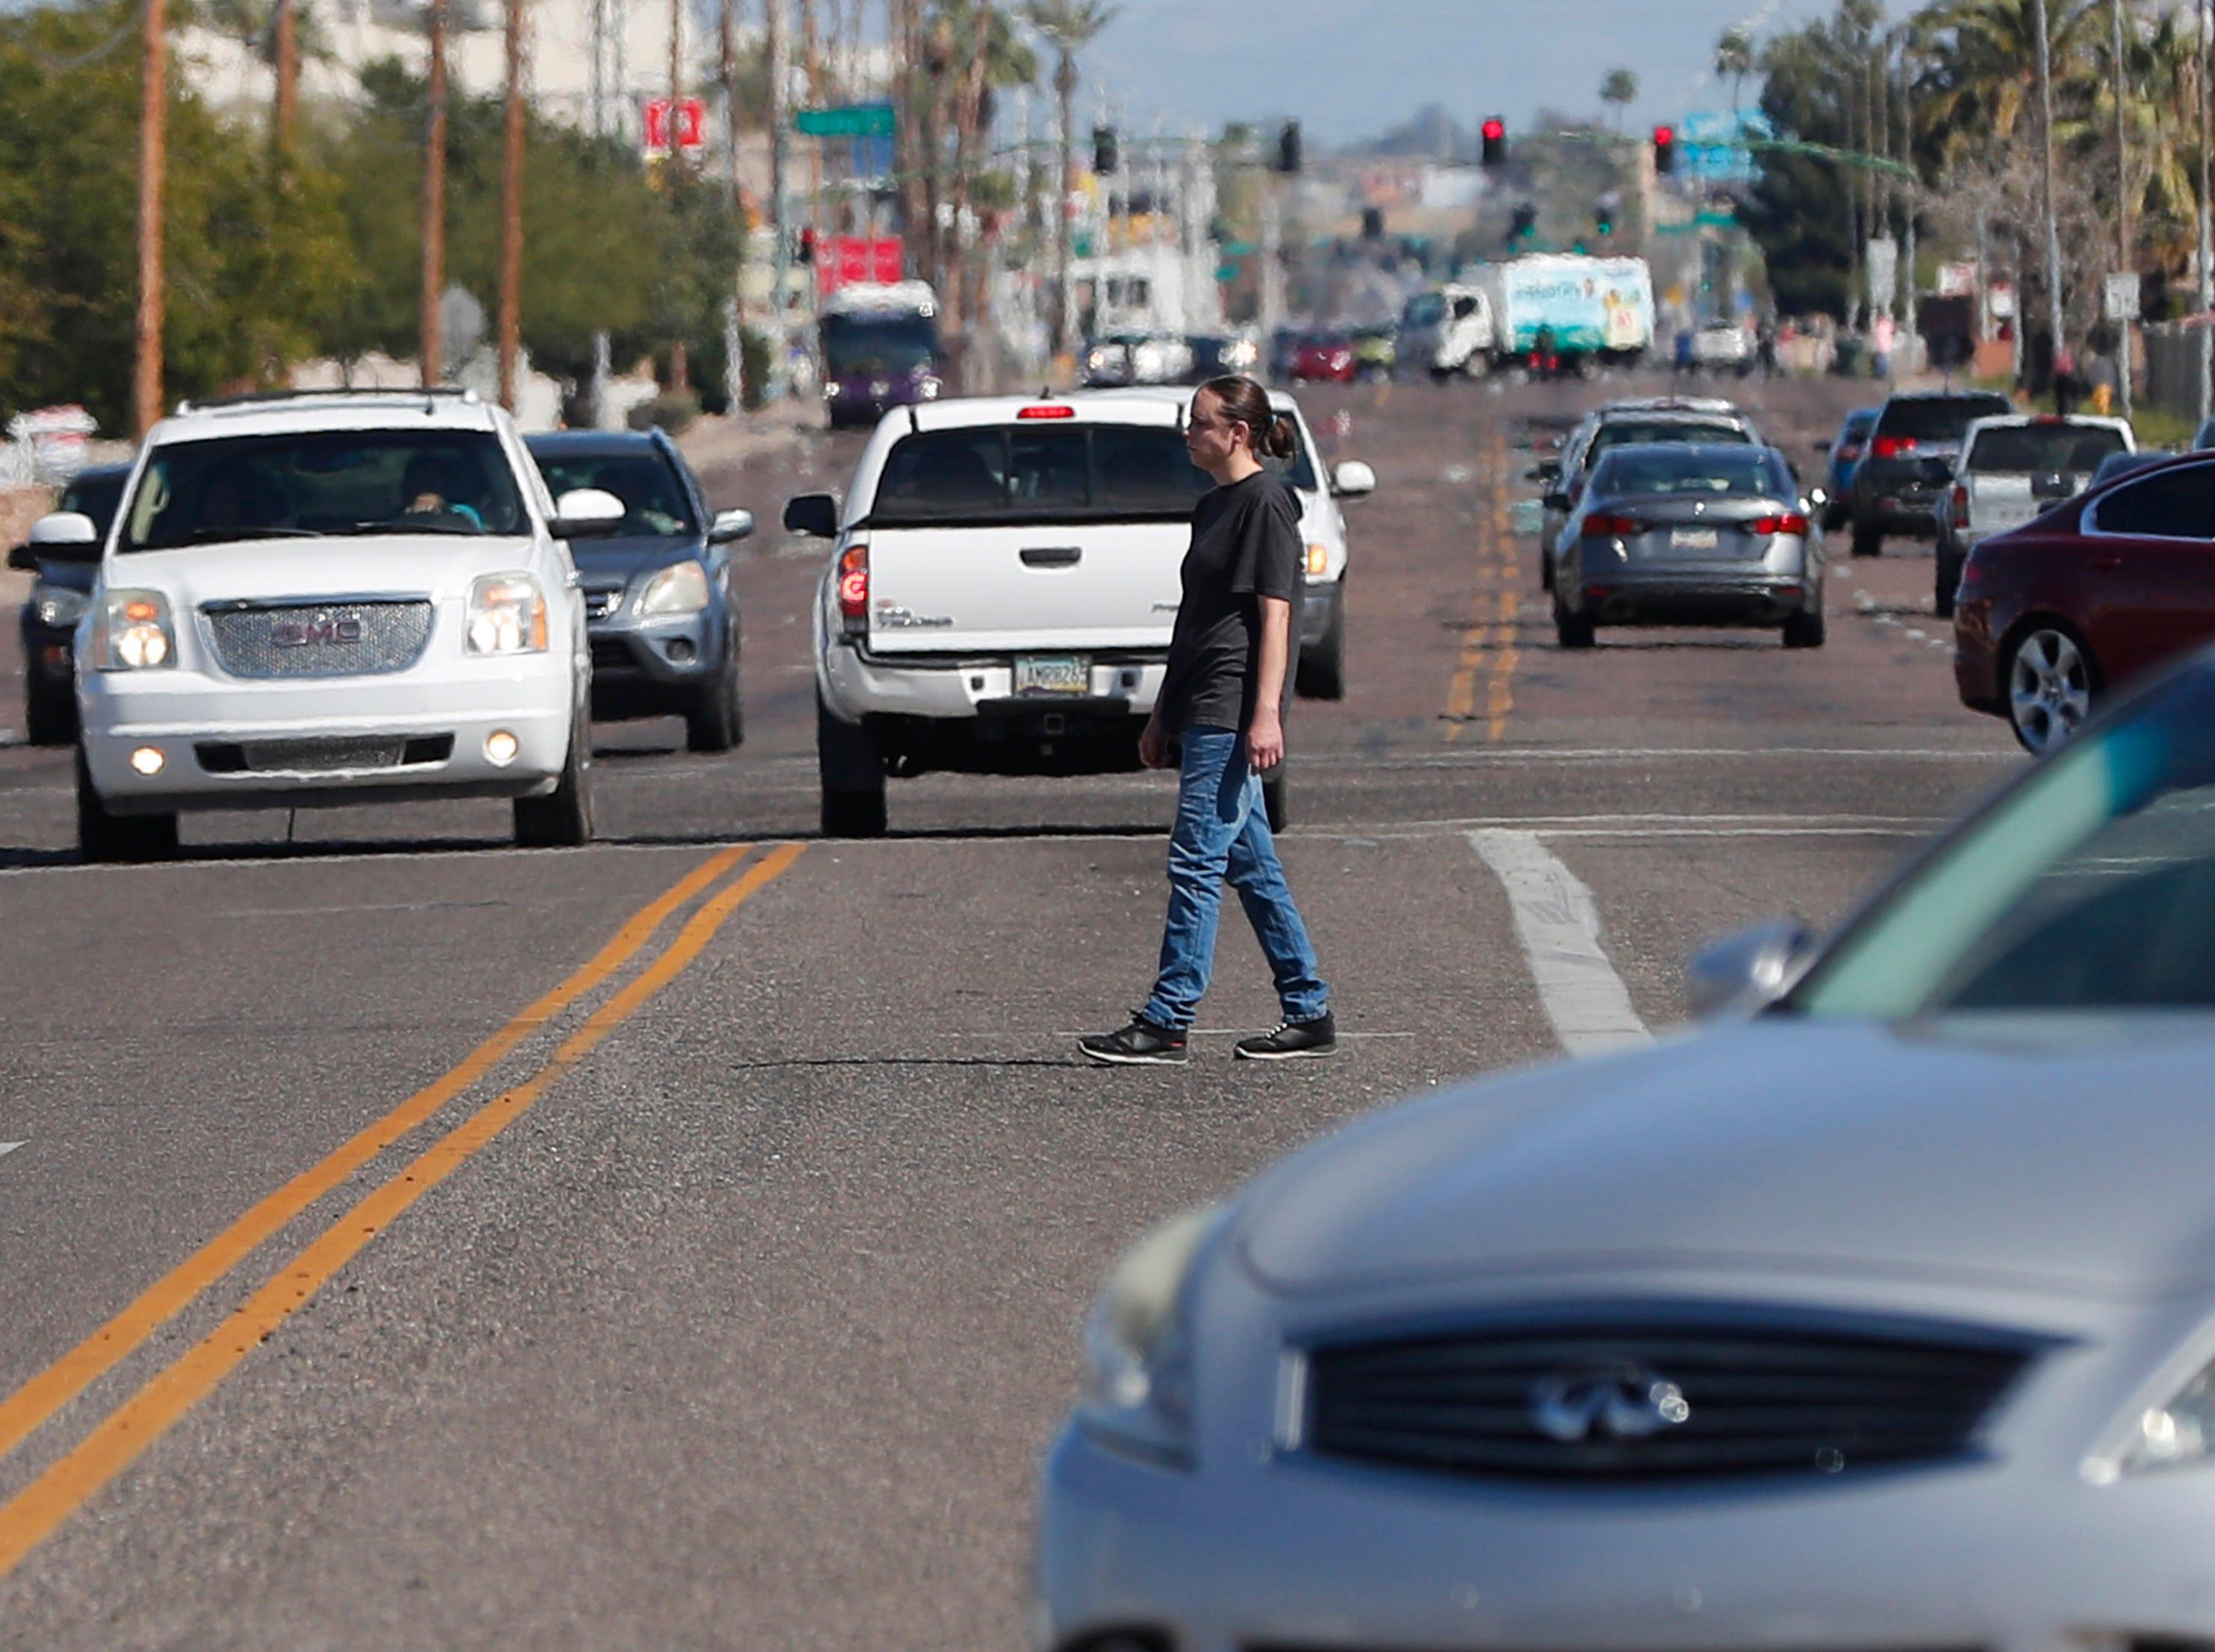 A pedestrian crosses Indian School Road, west of 19th Avenue in Phoenix on March 10, 2019.